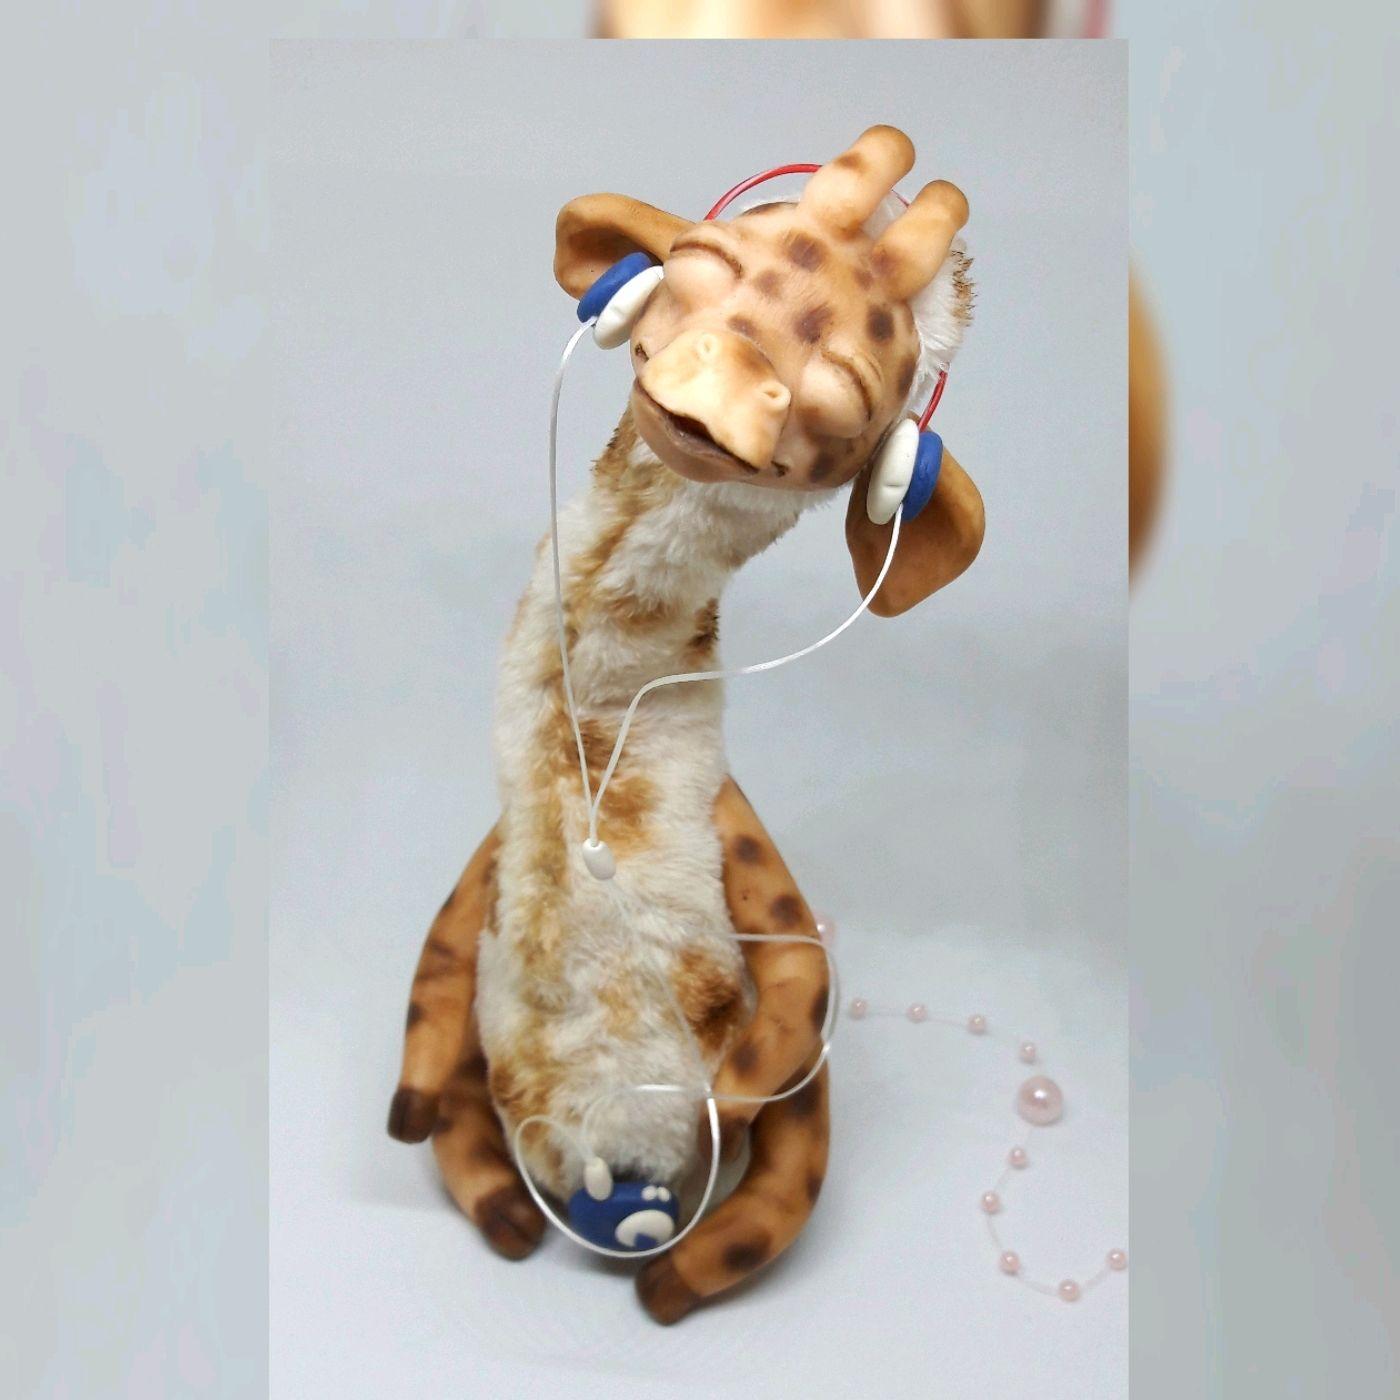 Жирафчик с плеером, Мягкие игрушки, Москва,  Фото №1